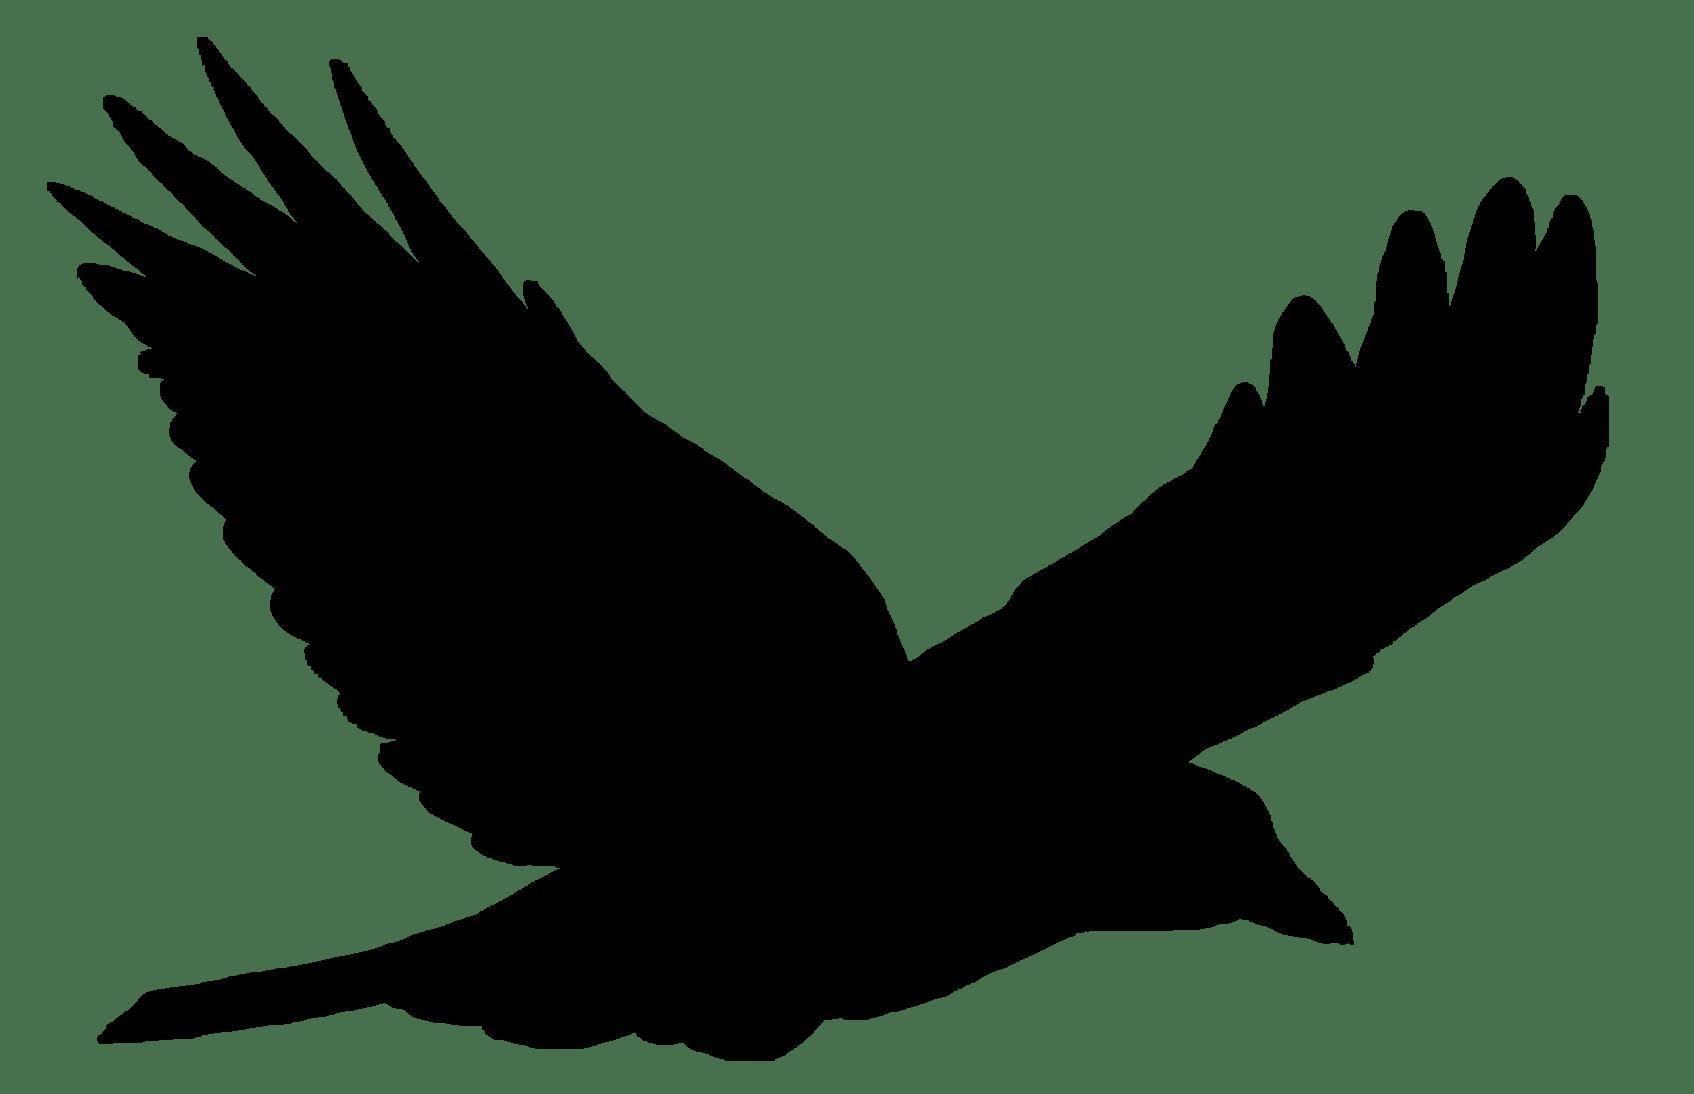 1694x1094 Bird Open Wings Clipart Silhouette Transparent Png Stickpng Lemonize